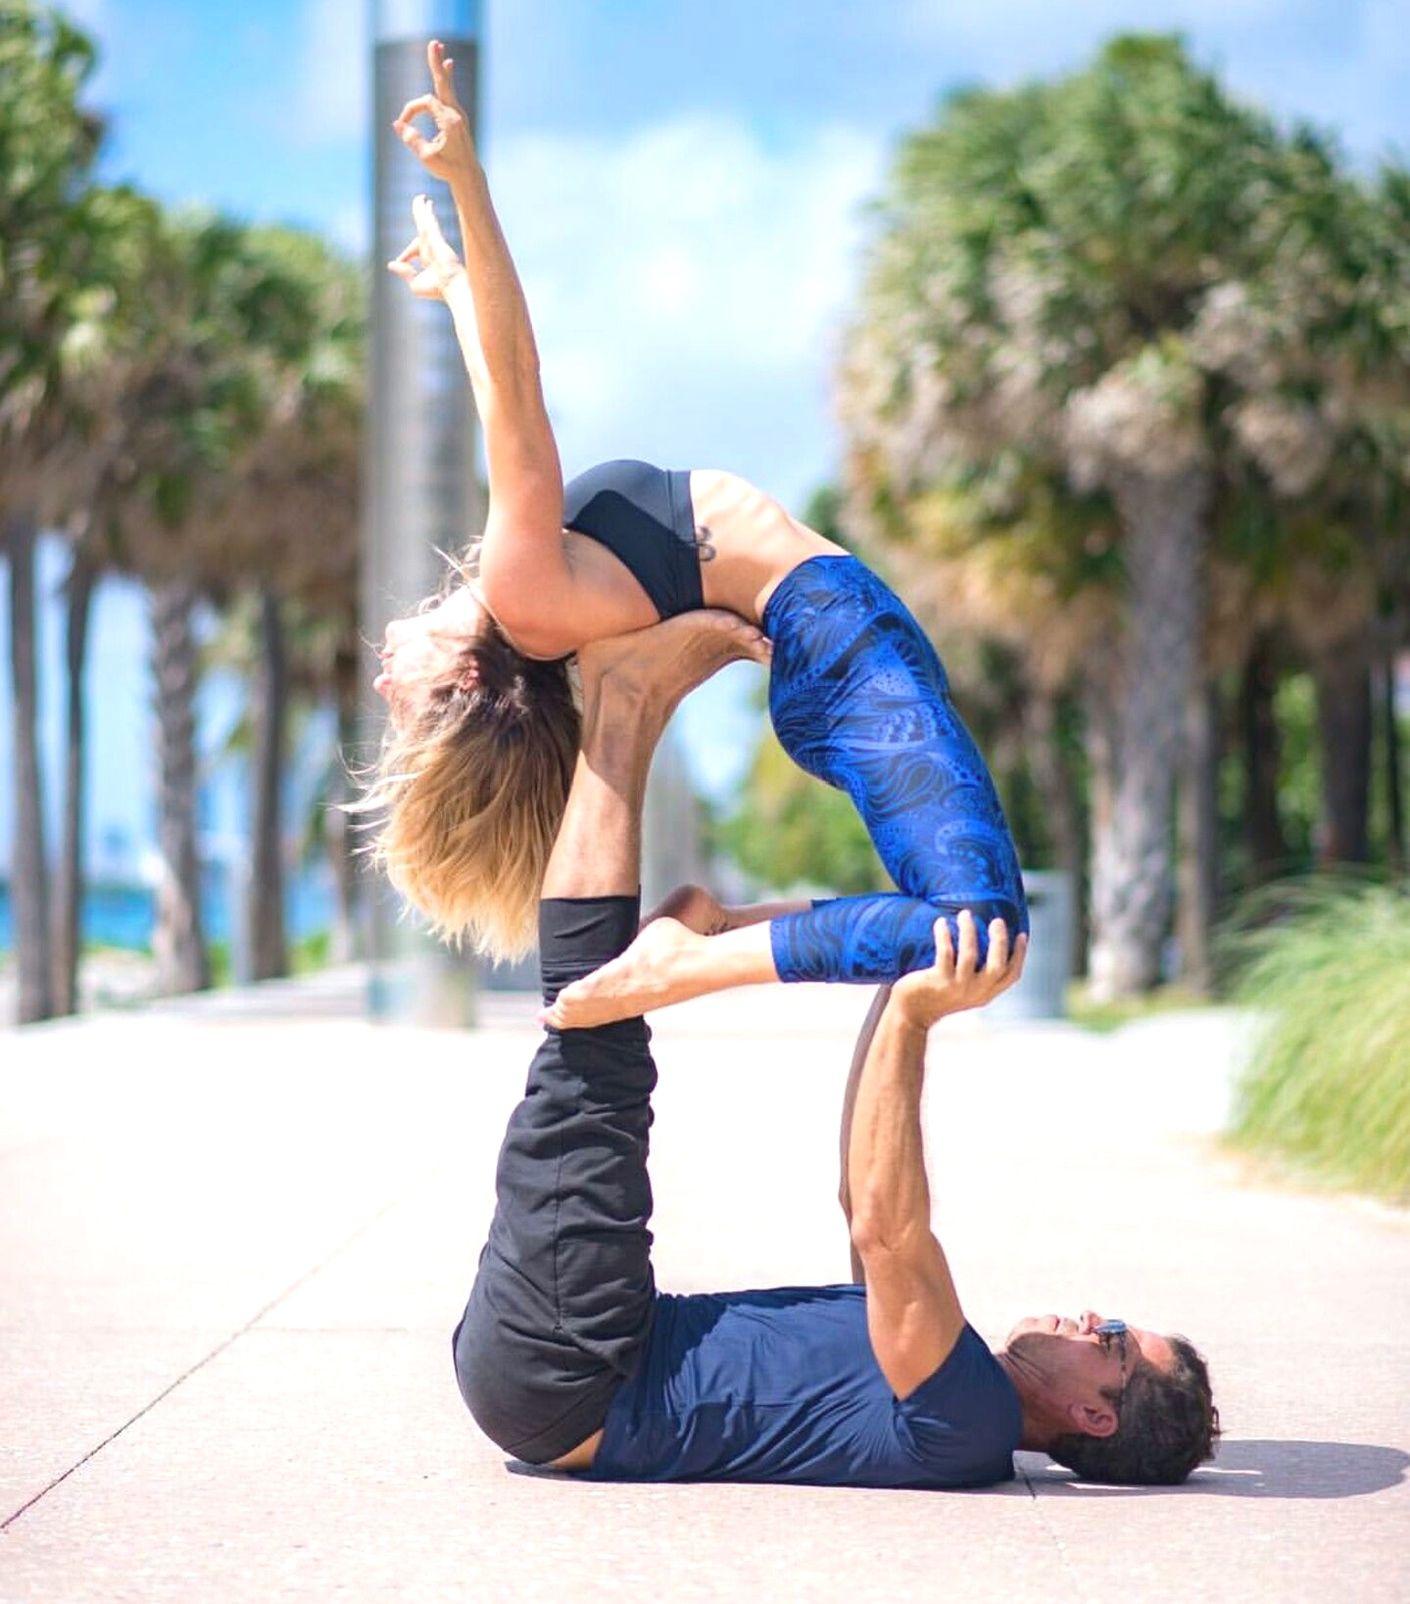 Partner Yoga Warm Up Partneryoga Couples Yoga Poses Acro Yoga